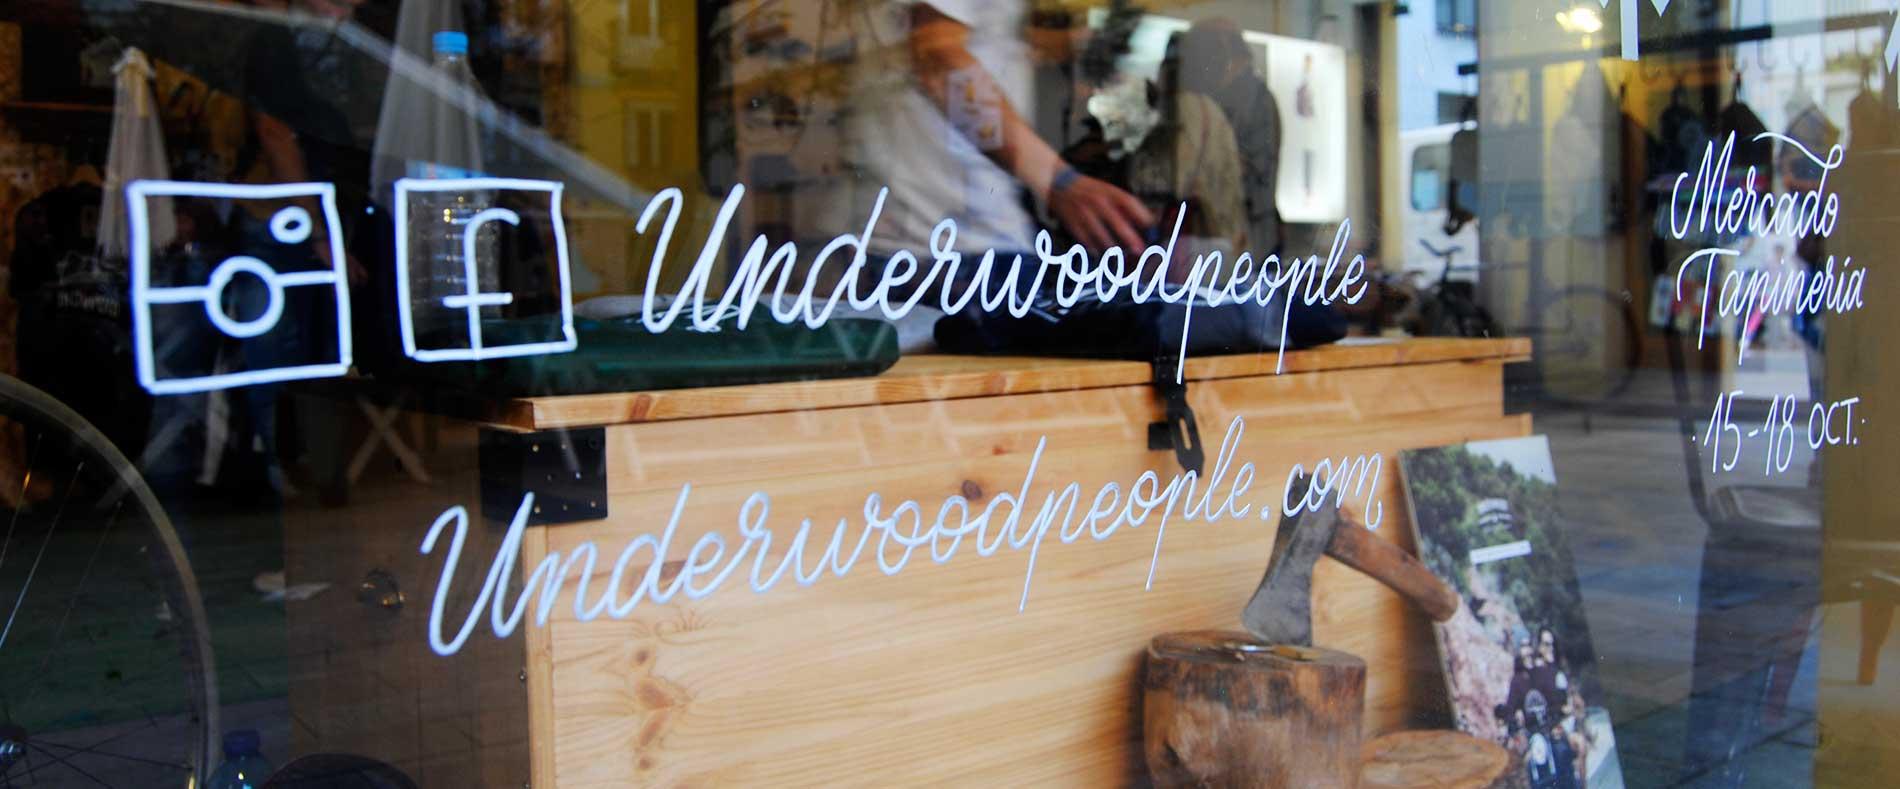 tapineria-underwood